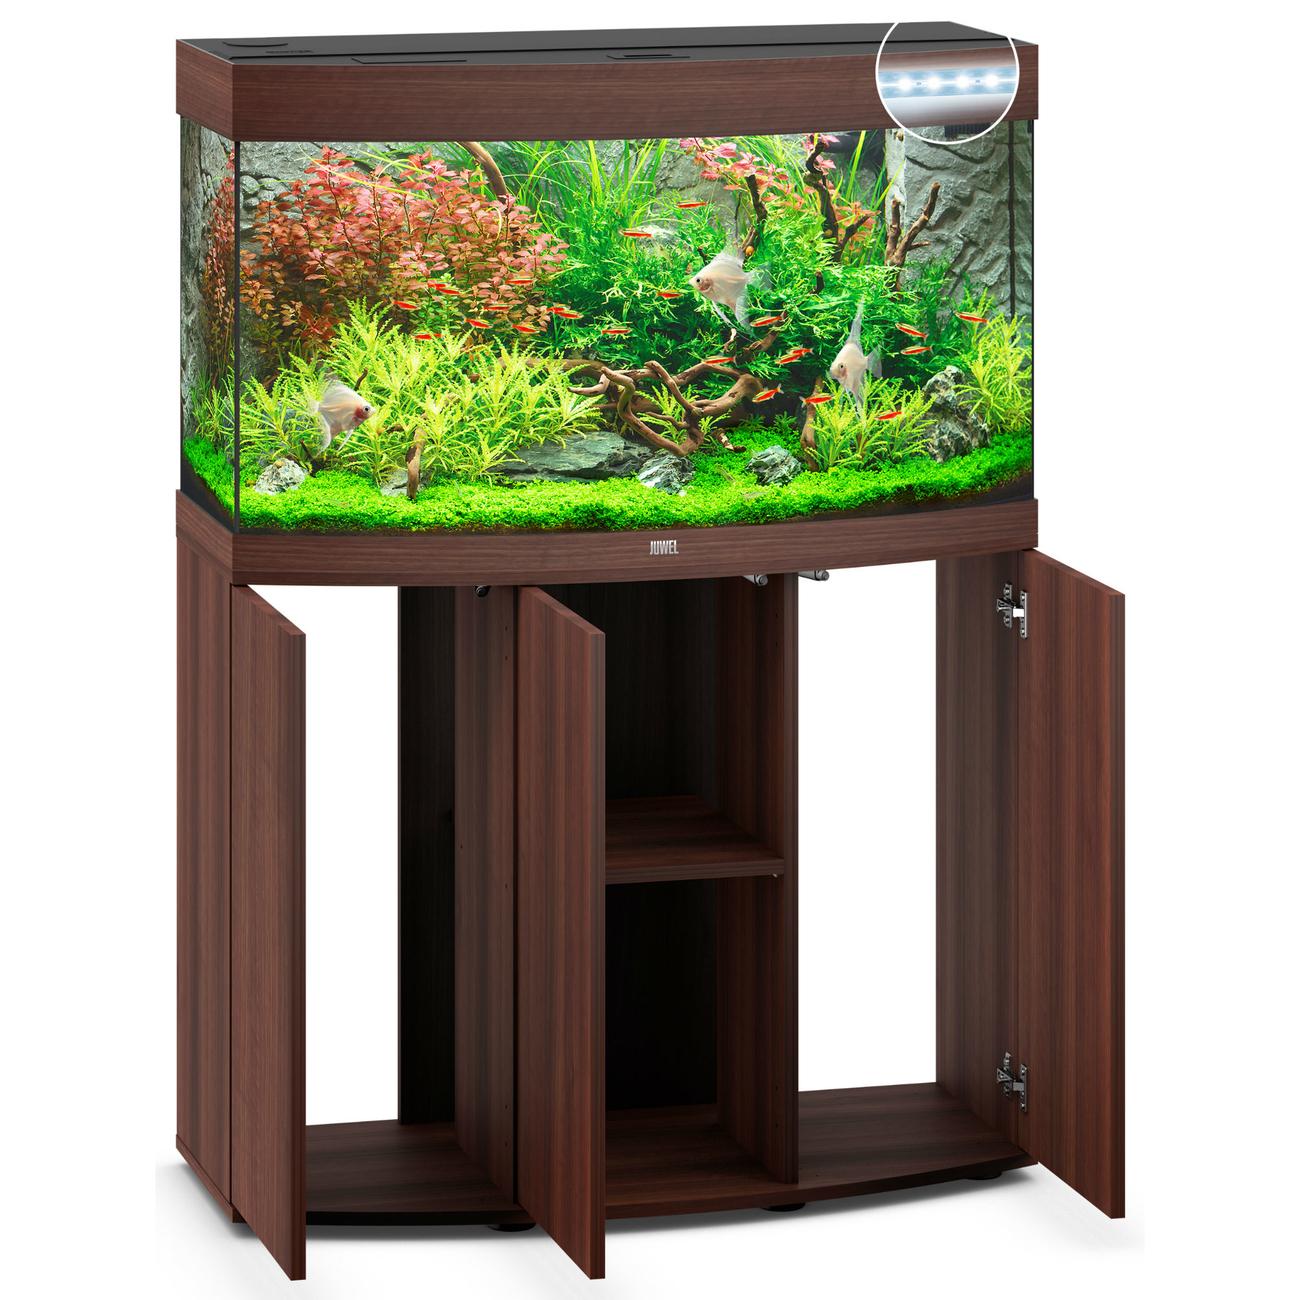 Juwel Vision 180 LED Aquarium mit Unterschrank, Bild 9